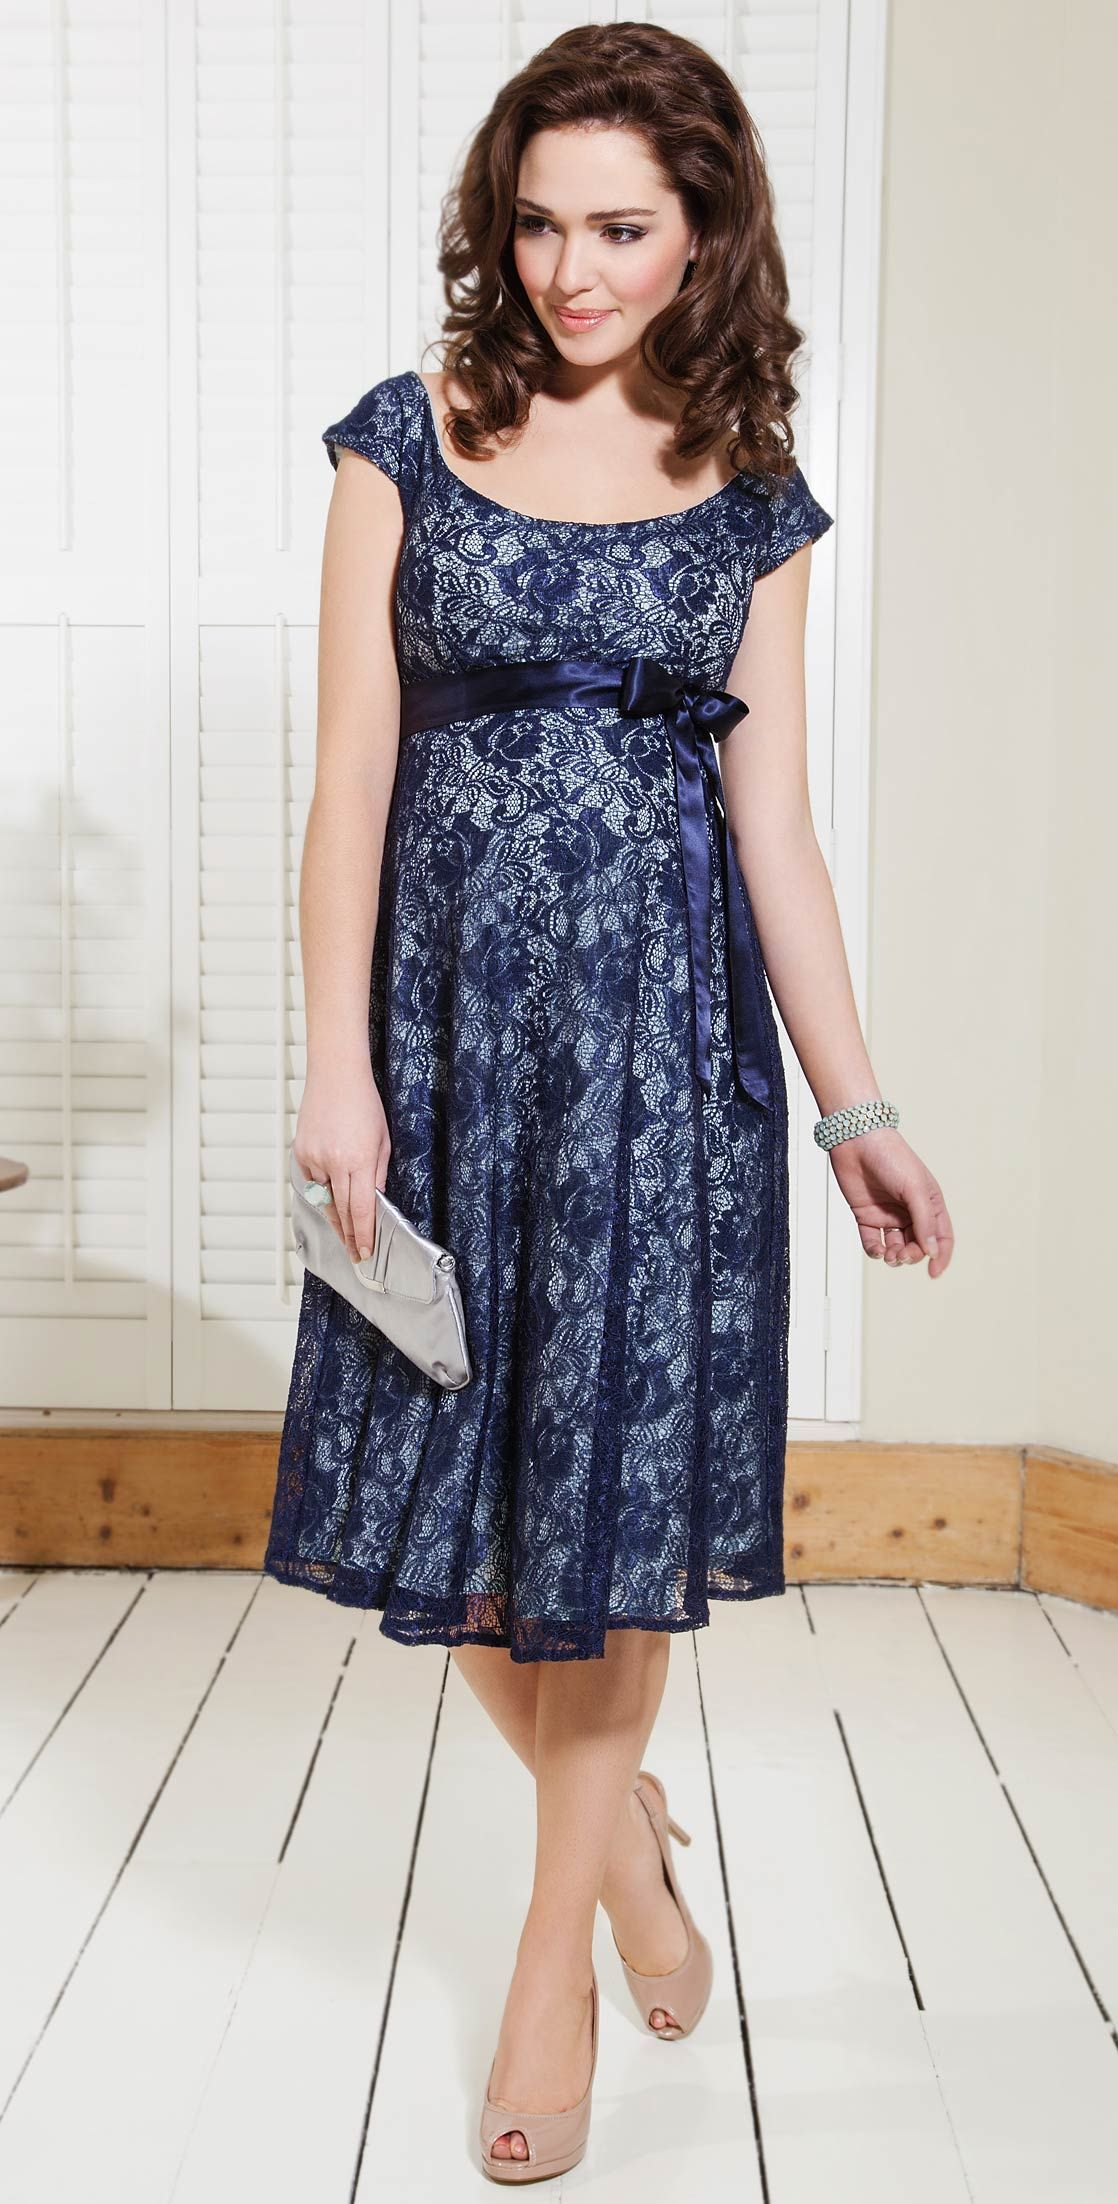 Maternity wedding dress with sleeves  Eliza Dress  Cute Maternity Clothes   Pinterest  Tiffany rose